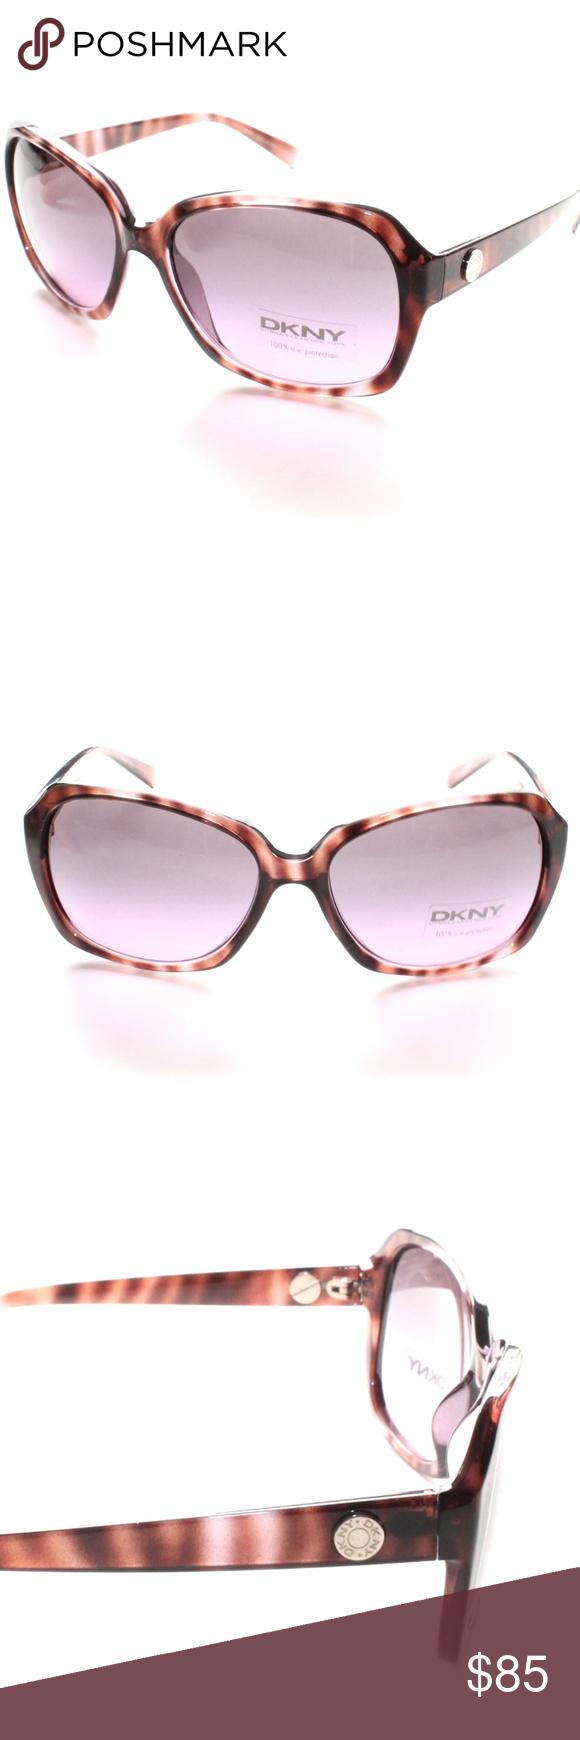 5018cfa1383e DKNY DY 4087 3538 90 Mauve Hor Square Sunglasses Brand New 100% authentic Donna  Karan DY 4087 3538 90 Mauve Hor Square Sunglasses Comes with Generic Case